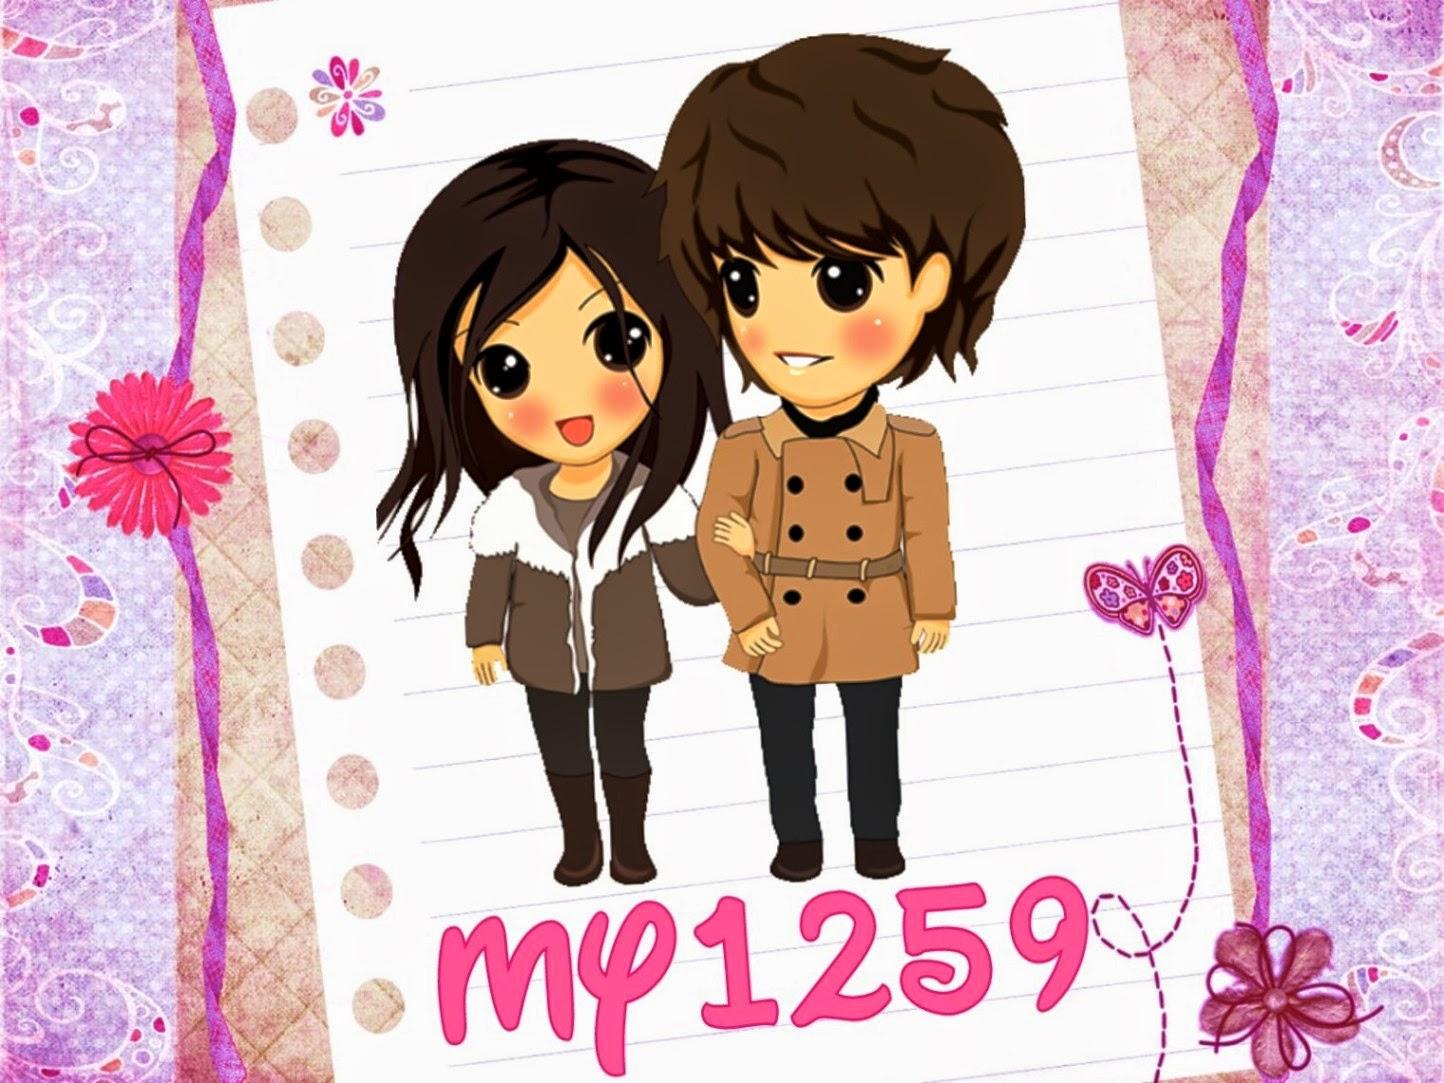 MY1259